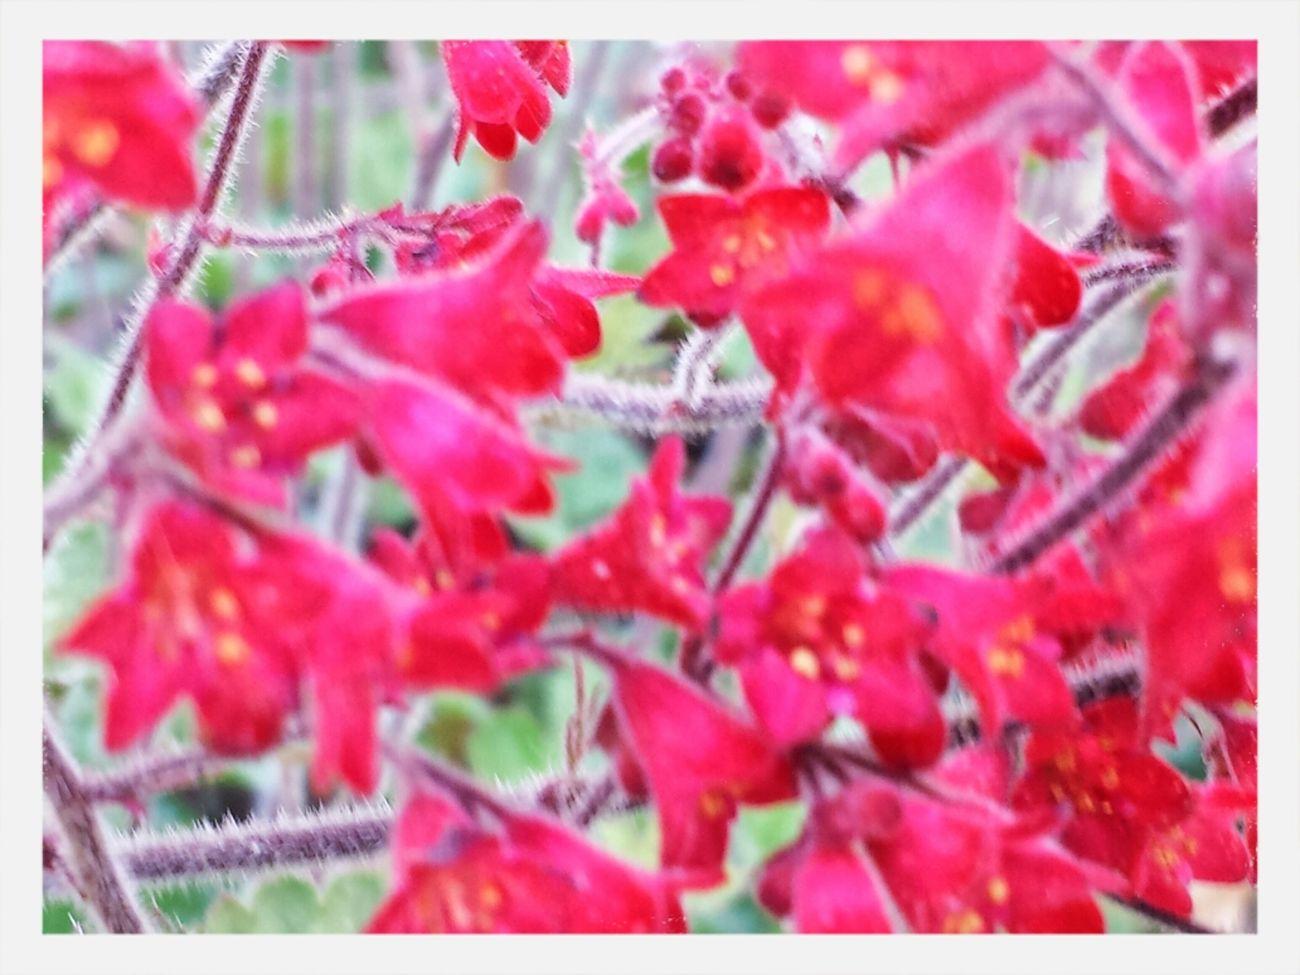 The Purist (no Edit, No Filter) Flower Collection Wonhglück